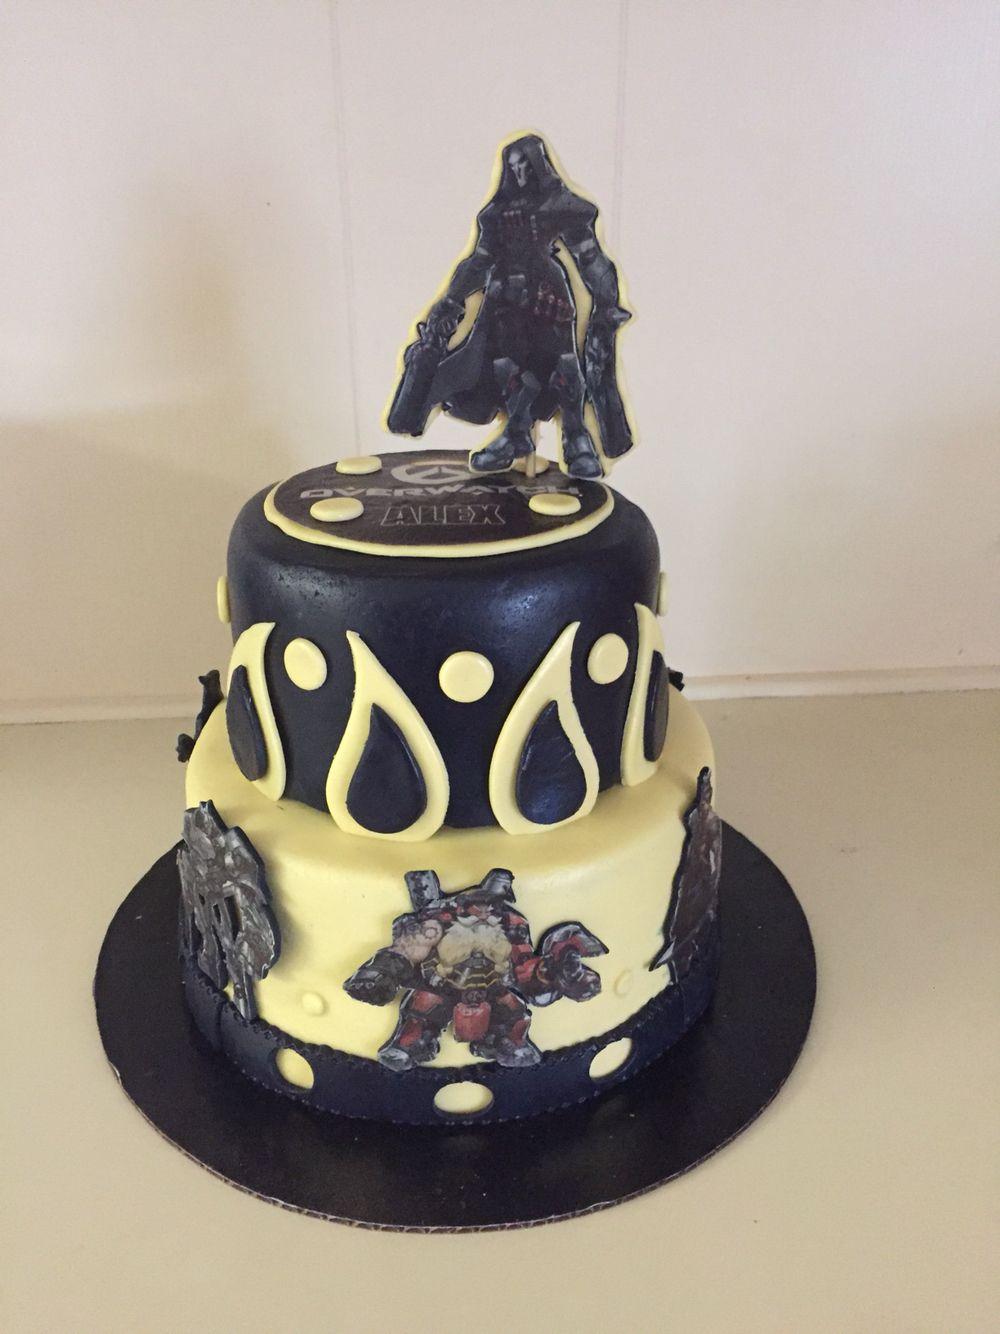 Overwatch video game cake Cakes by Belinda Pinterest